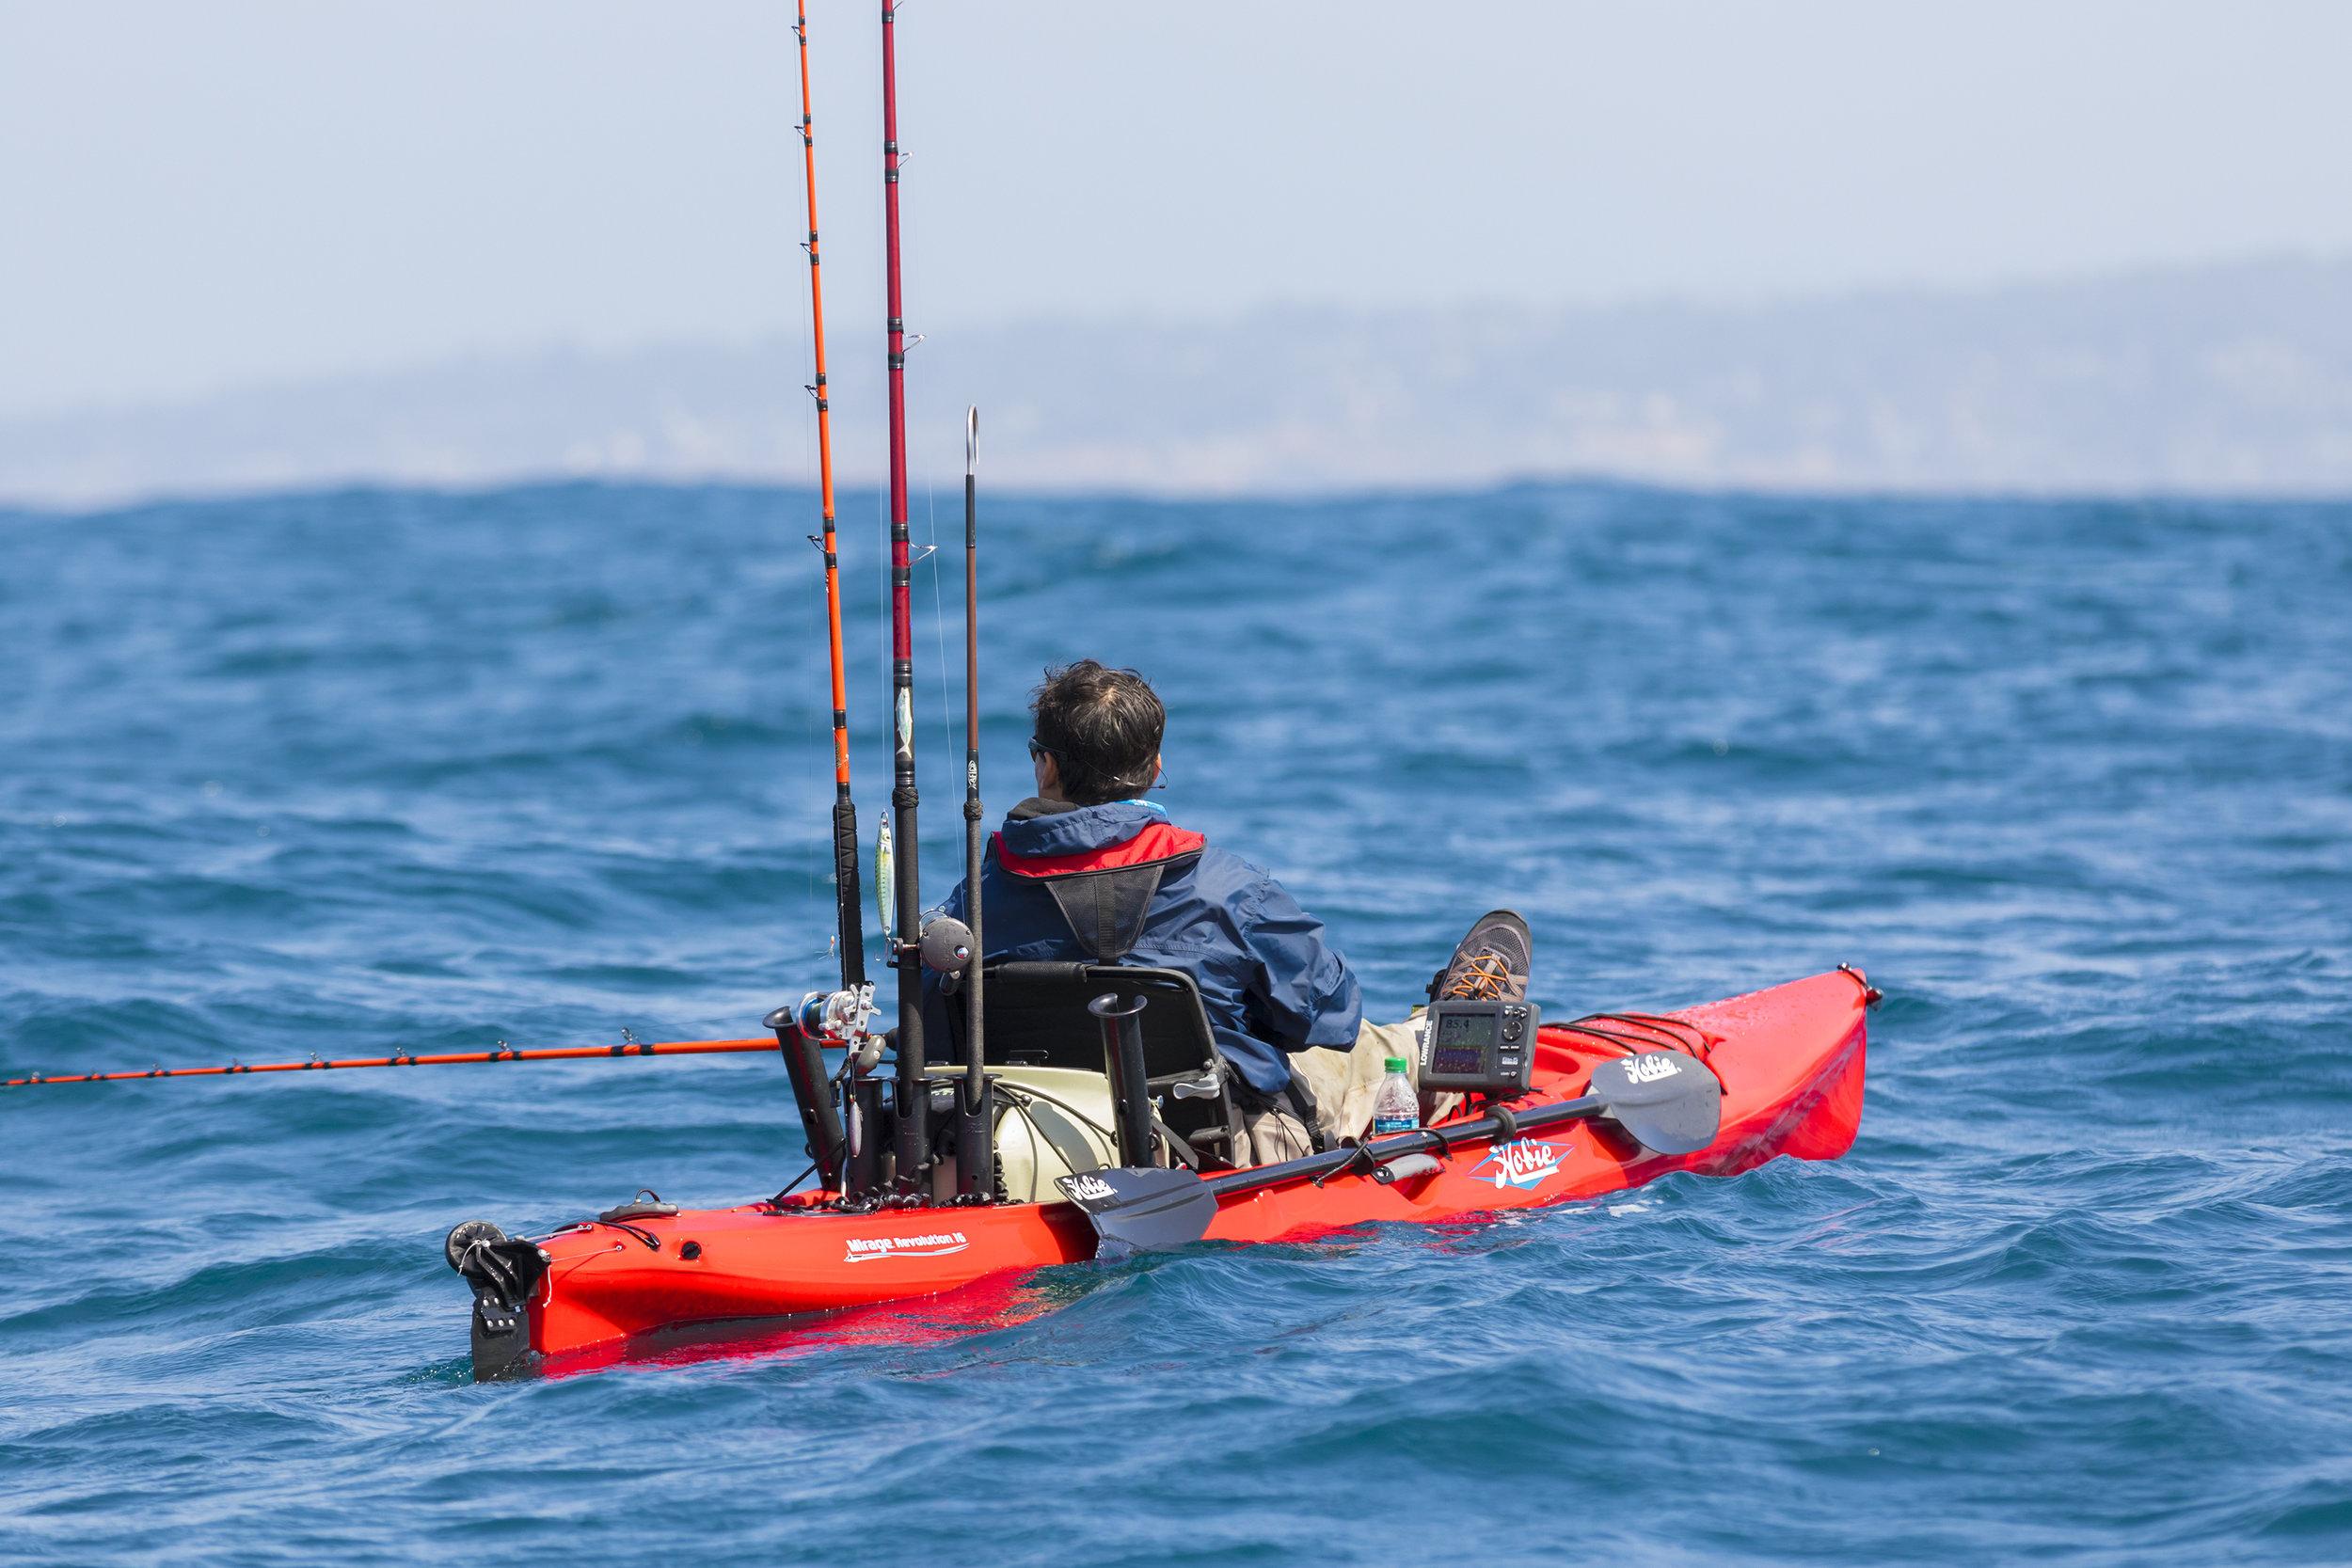 Revolution16-action-fishing-kevin-LaJolla-03-full.jpg